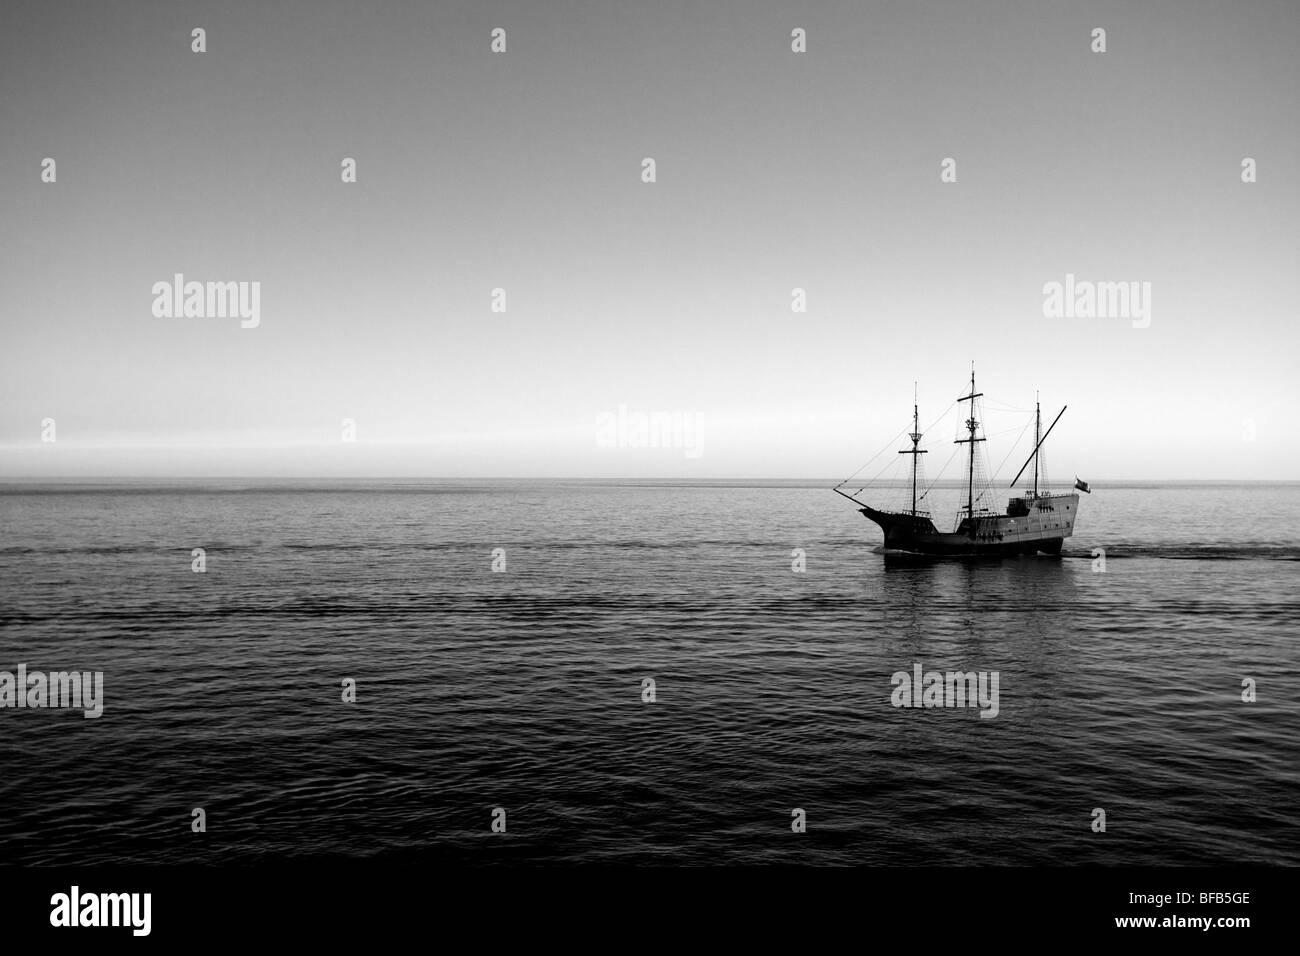 Pirate ship on the Adriatic sea, Dubrovnik, Croatia - Stock Image